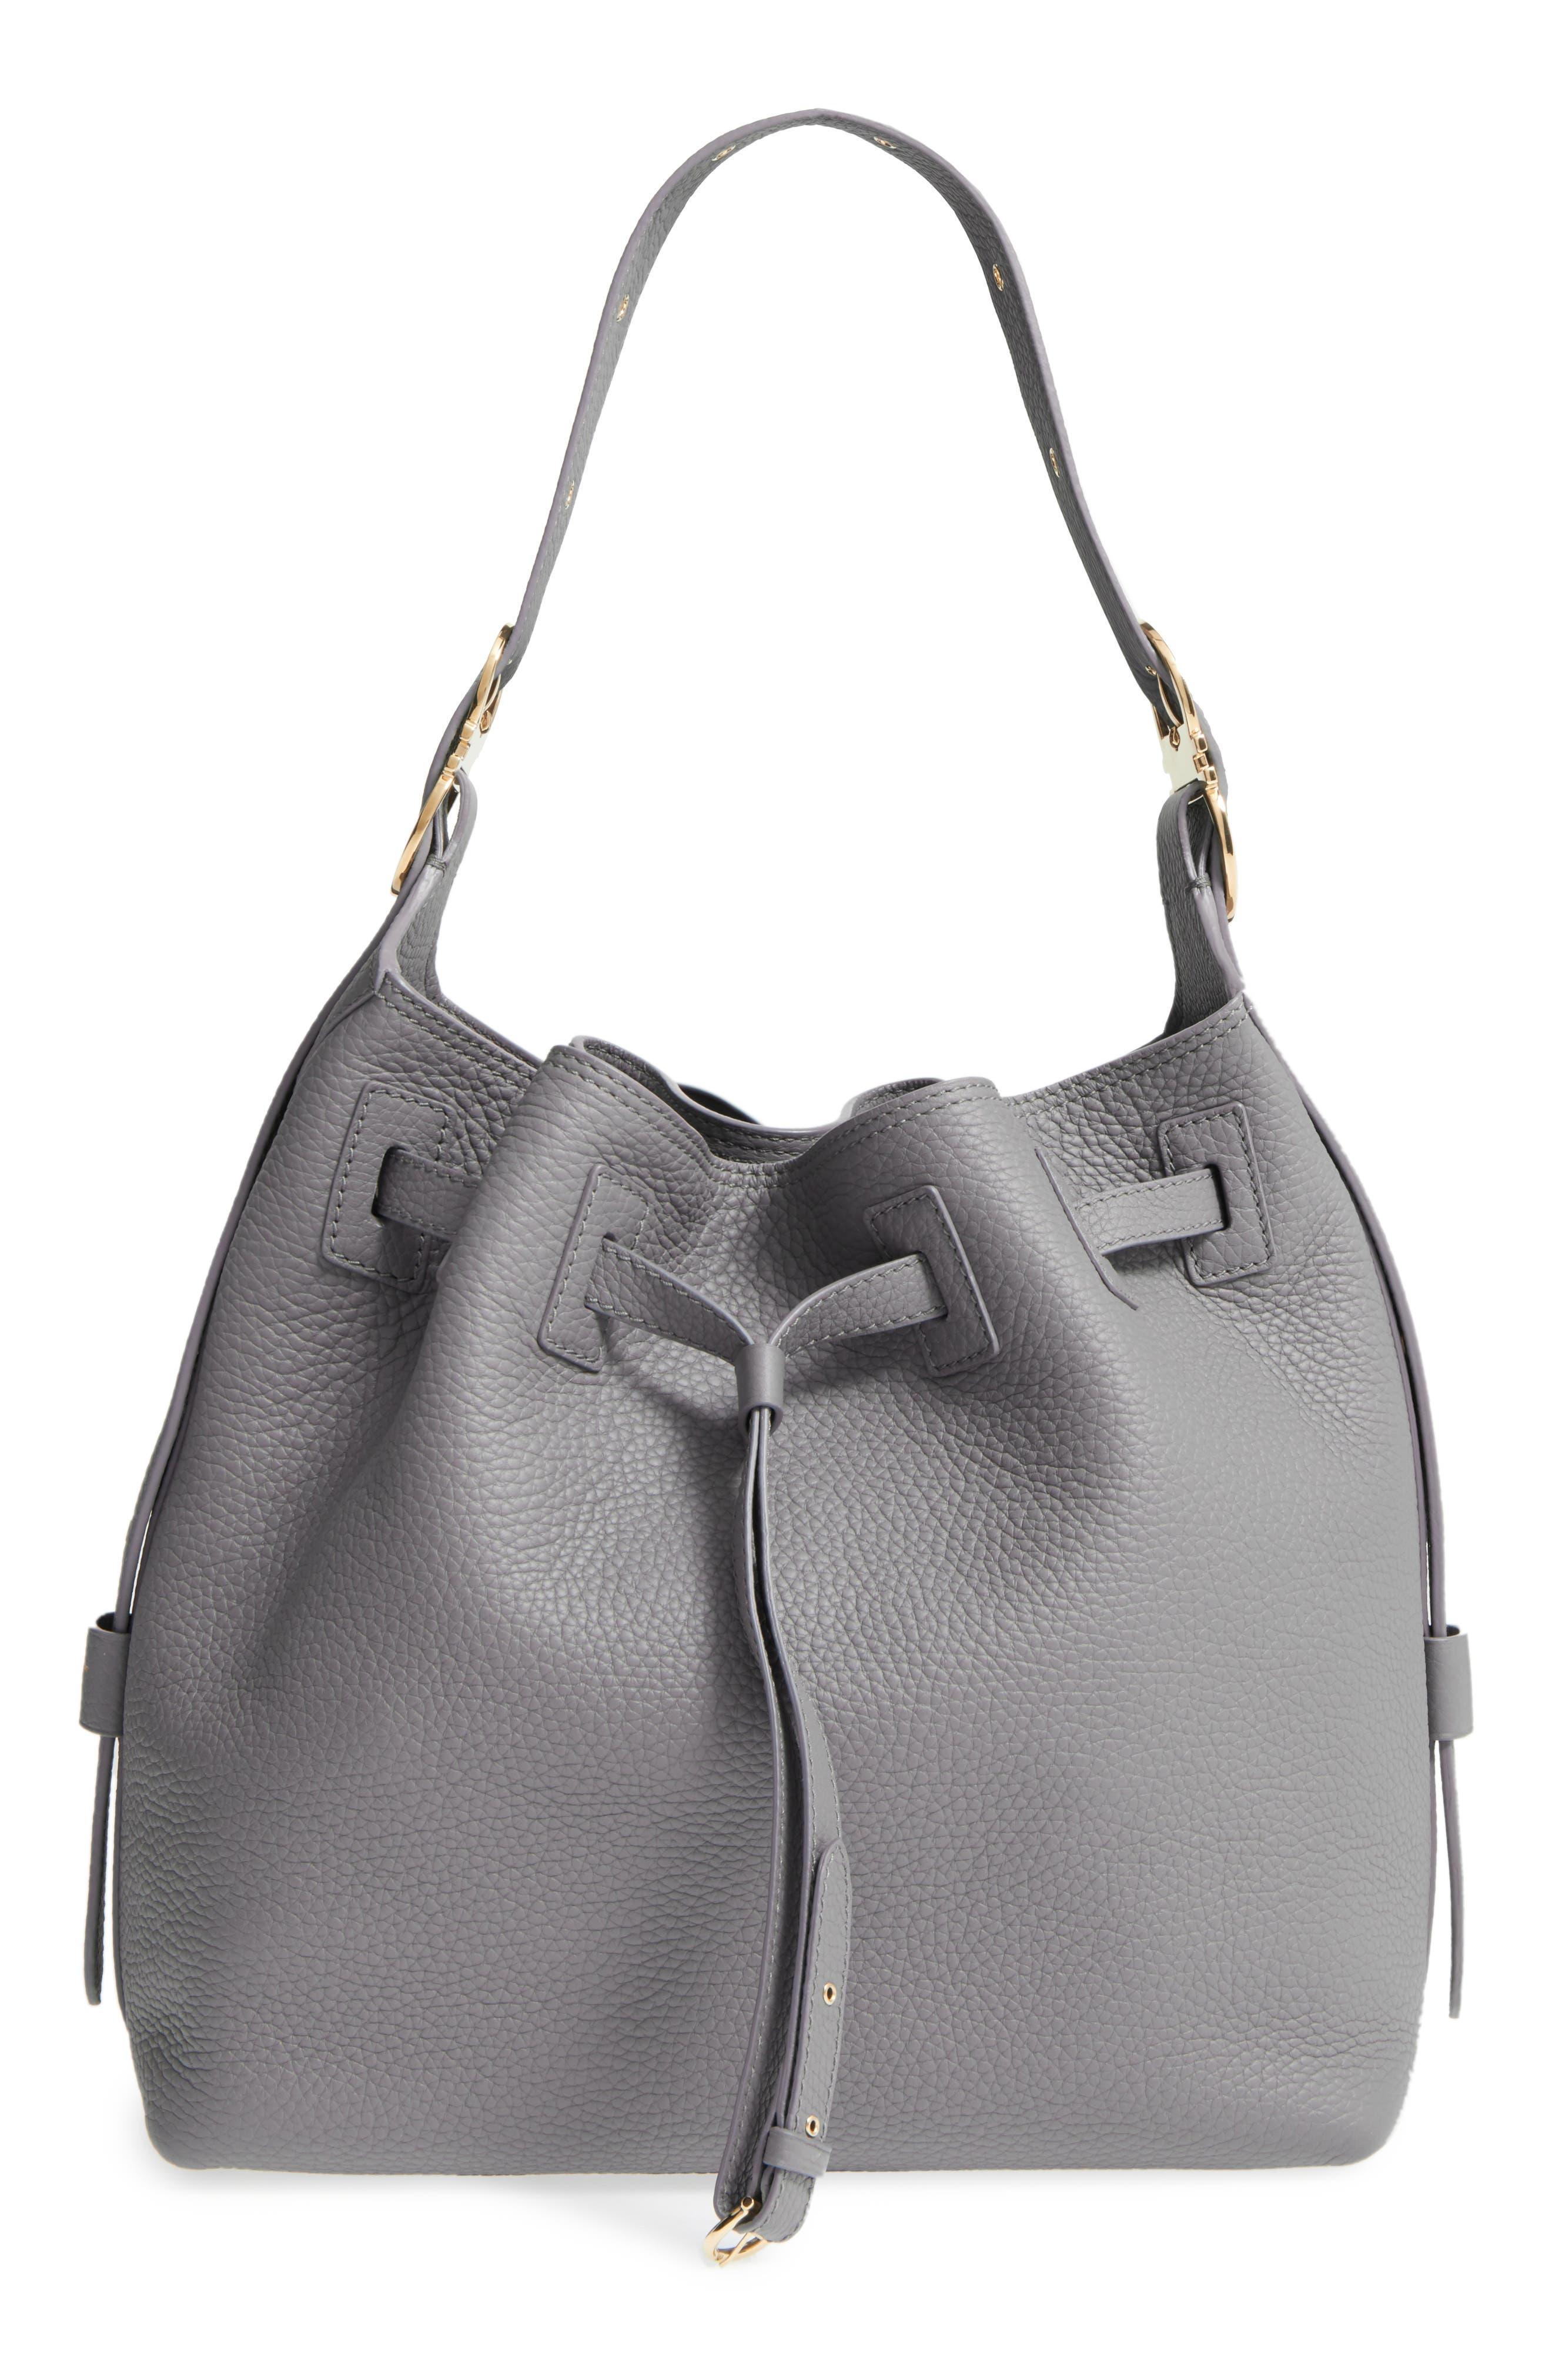 SALVATORE FERRAGAMO Pebbled Leather Drawstring Bucket Bag, Main, color, 020